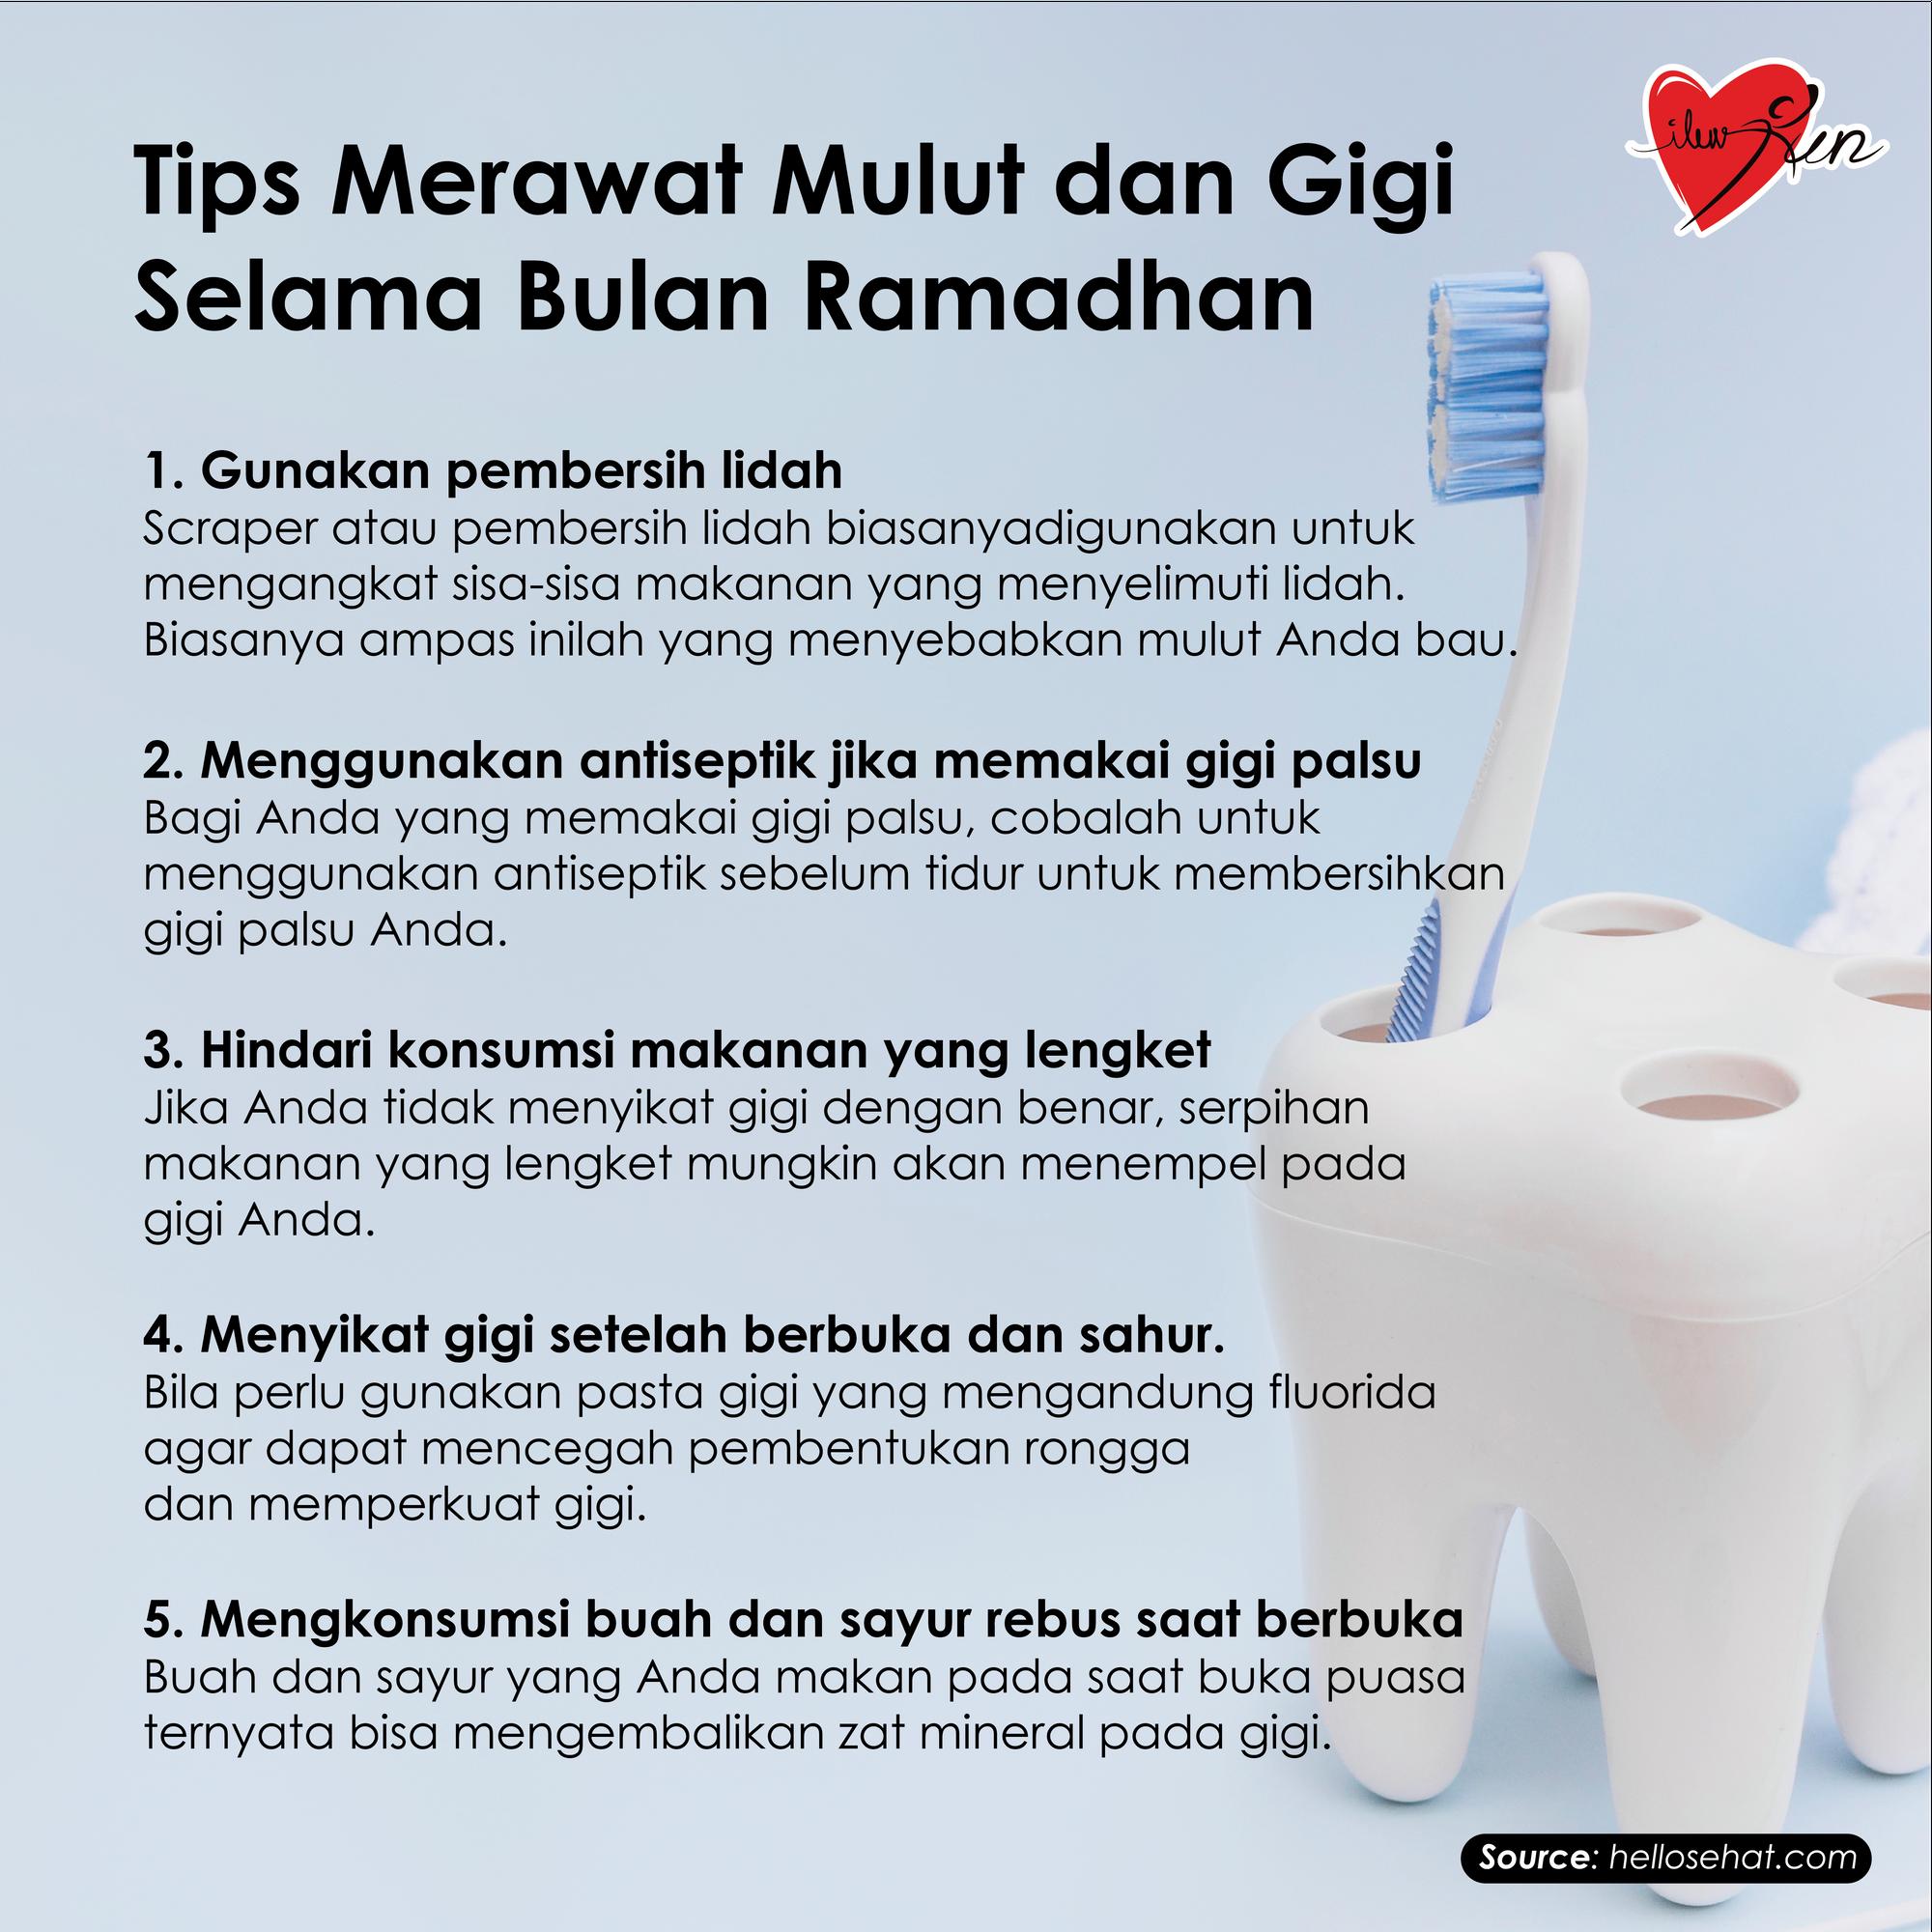 Tips Merawat Mulut Dan Gigi Selama Bulan Ramadhan 1 Gunakan Pembersih Lidah 2 Menggunakan Antiseptik Jika Memakai Gigi Pals Pembersih Lidah Gigi Palsu Gigi